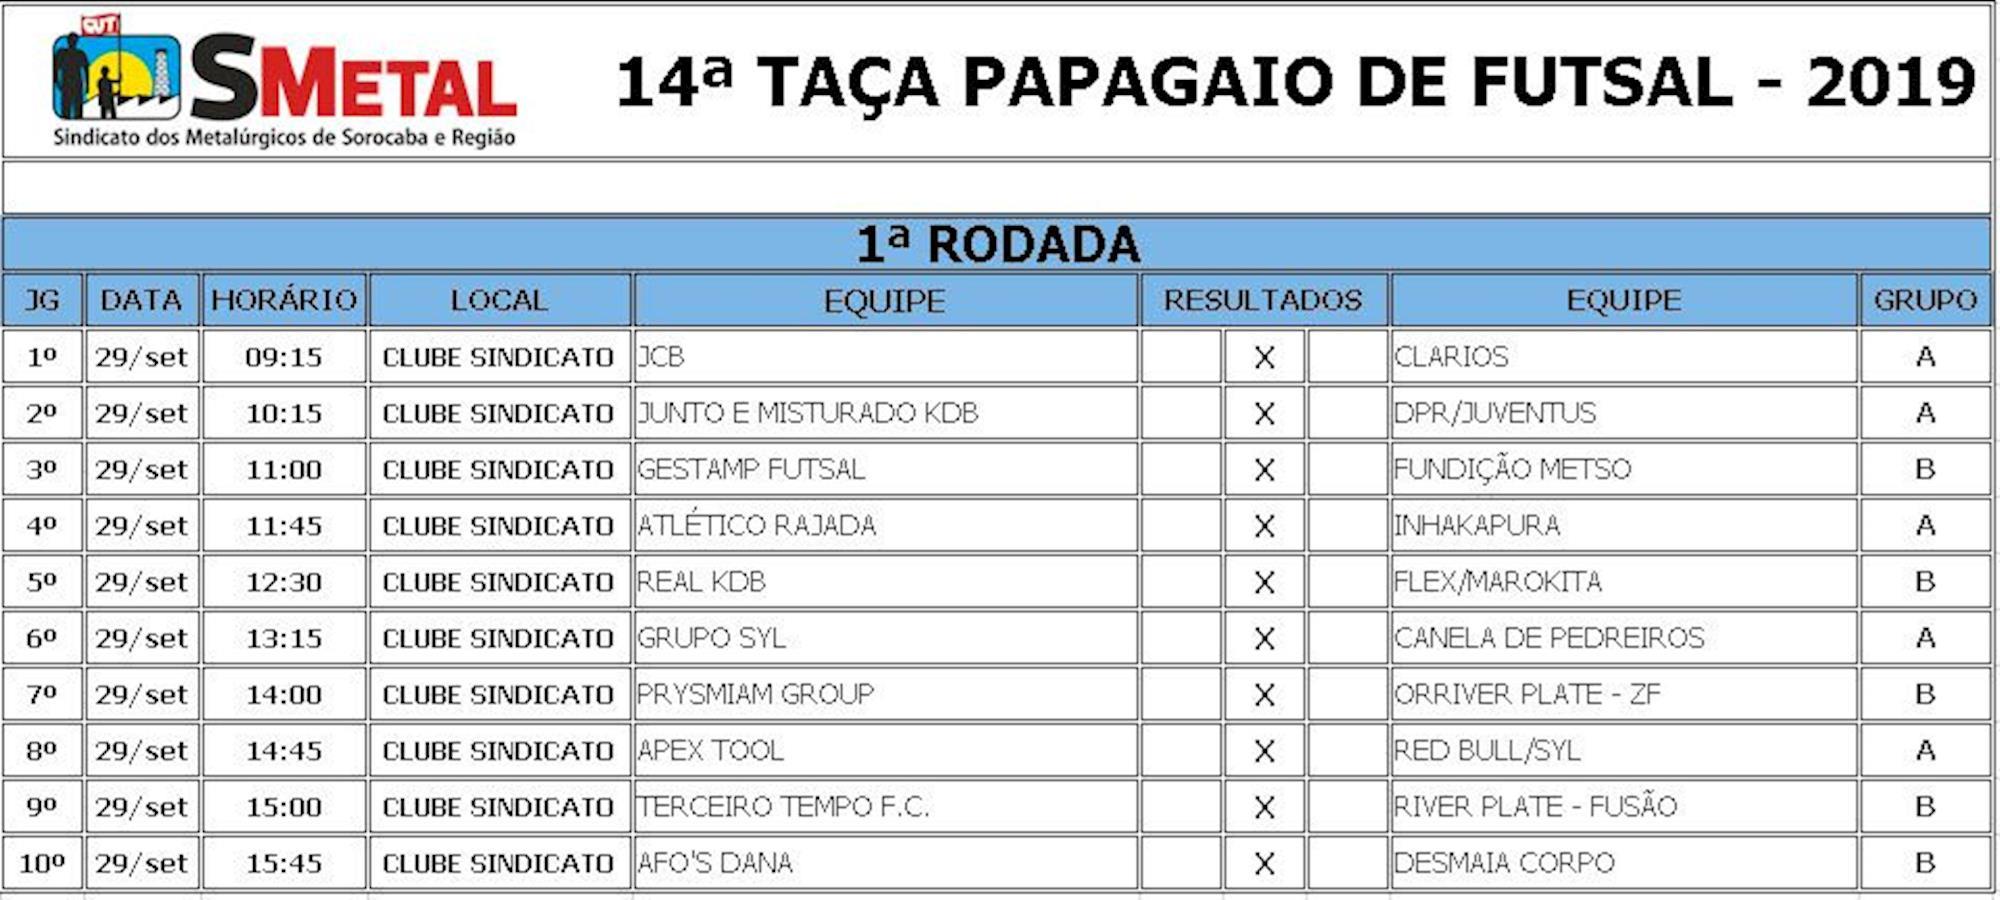 tabela, futsa, sindicato, papagaio, taça,, Divulgação / Livofus